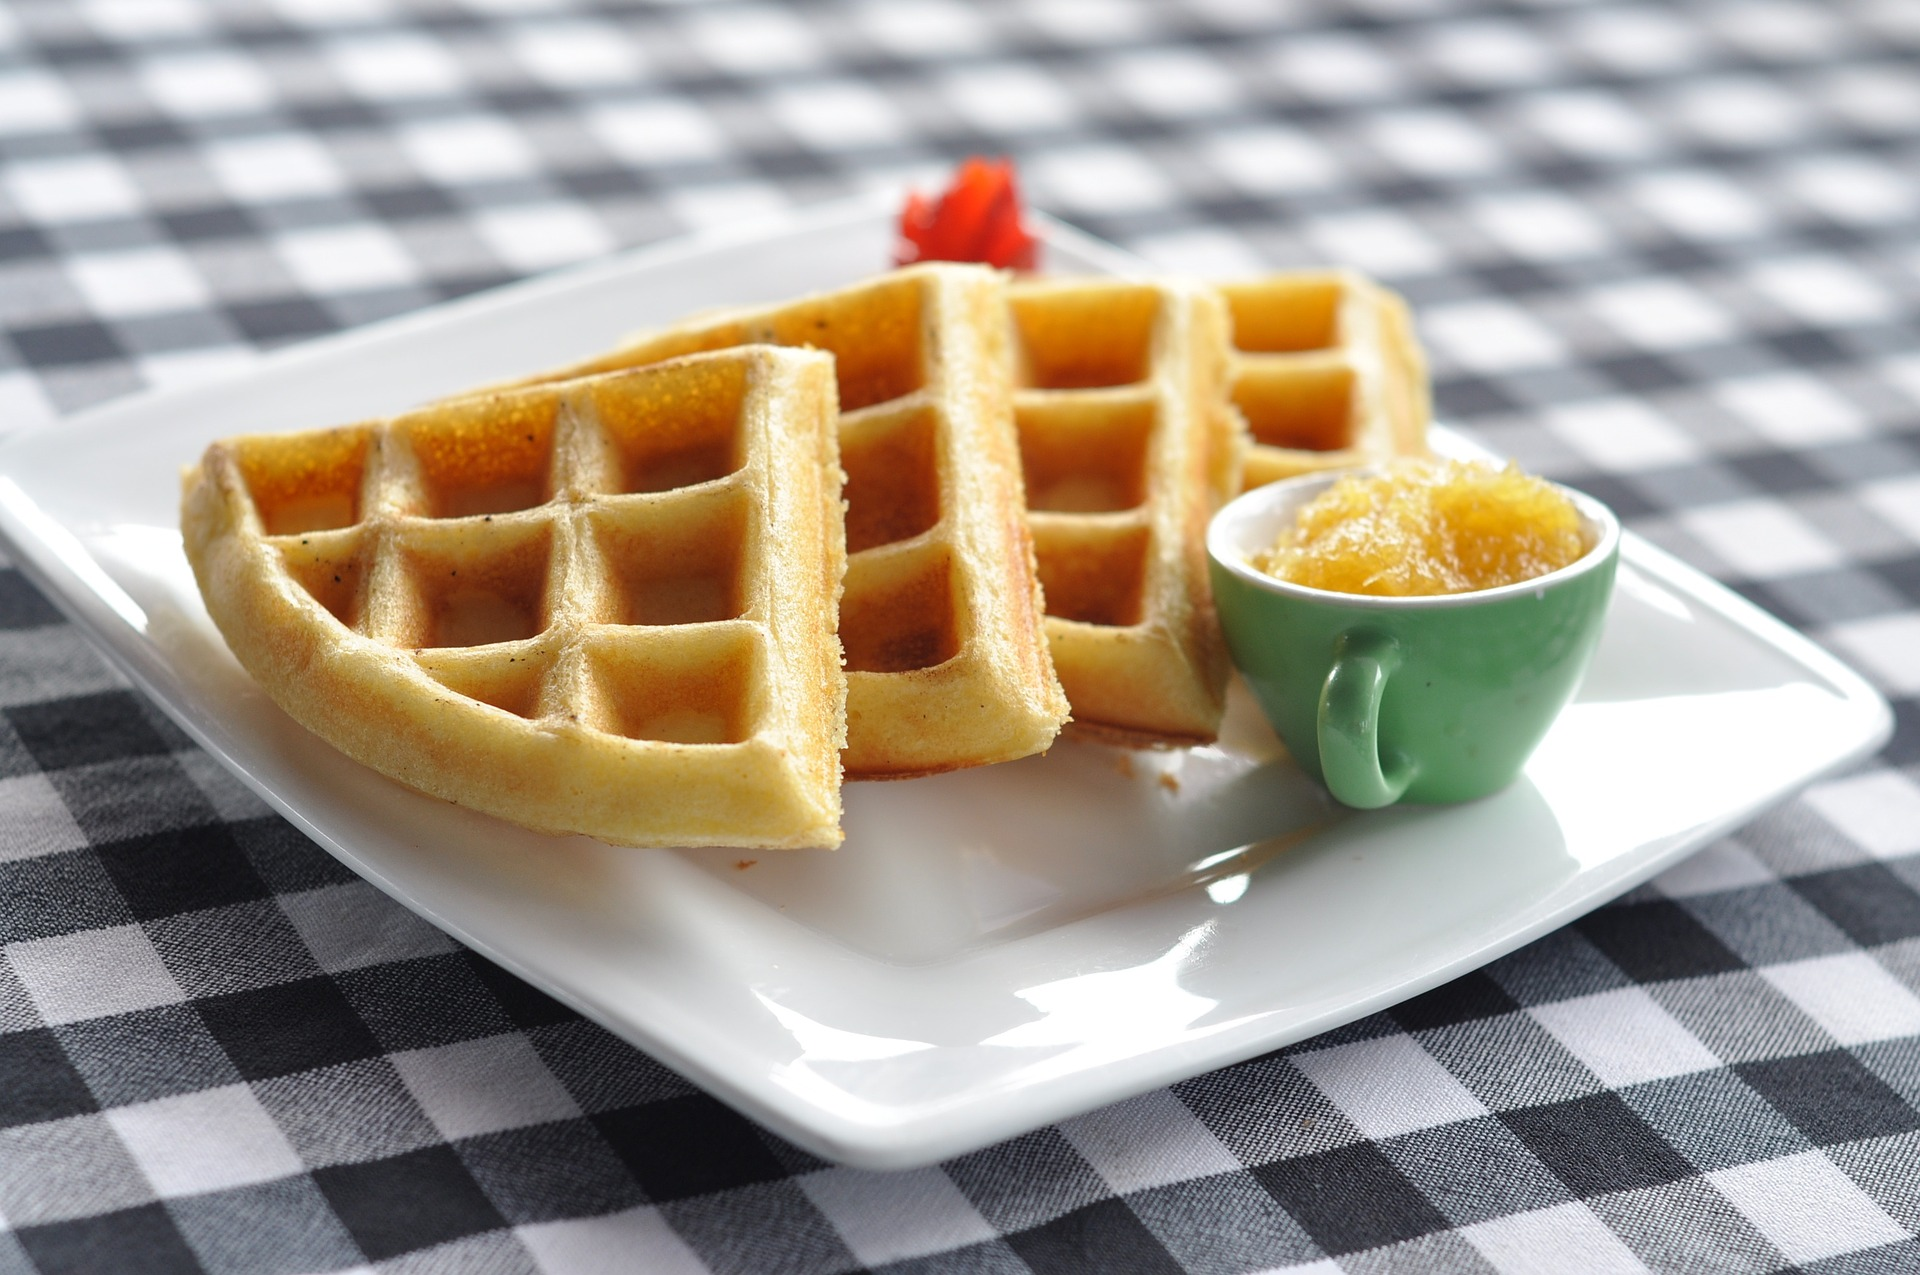 Ricetta waffle senza uova e burro